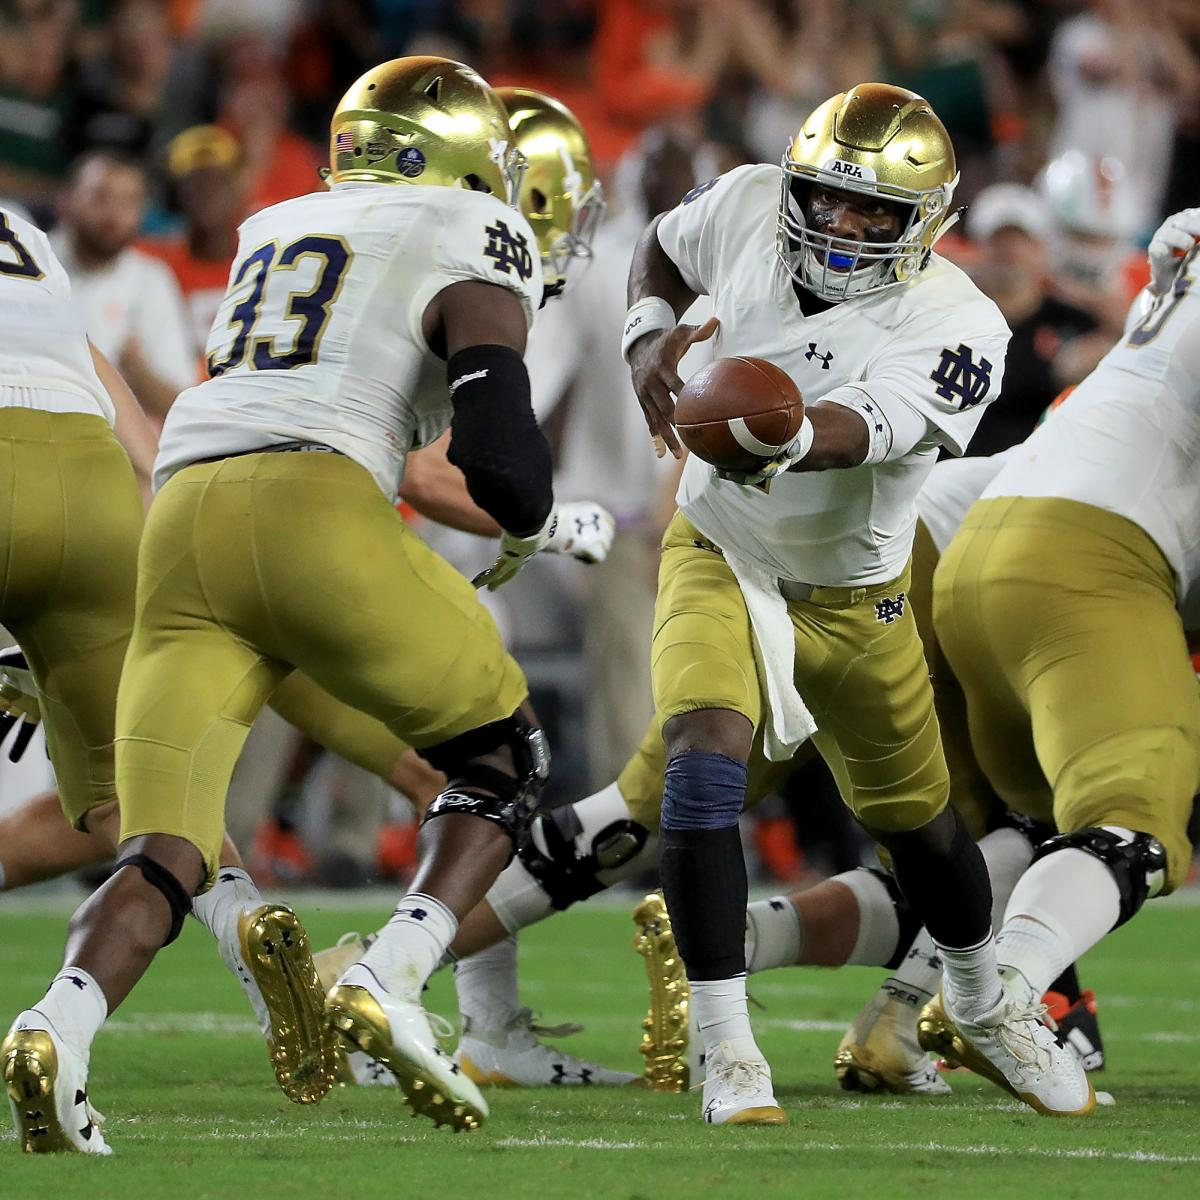 Navy Midshipmen Vs. Notre Dame Fighting Irish Odds